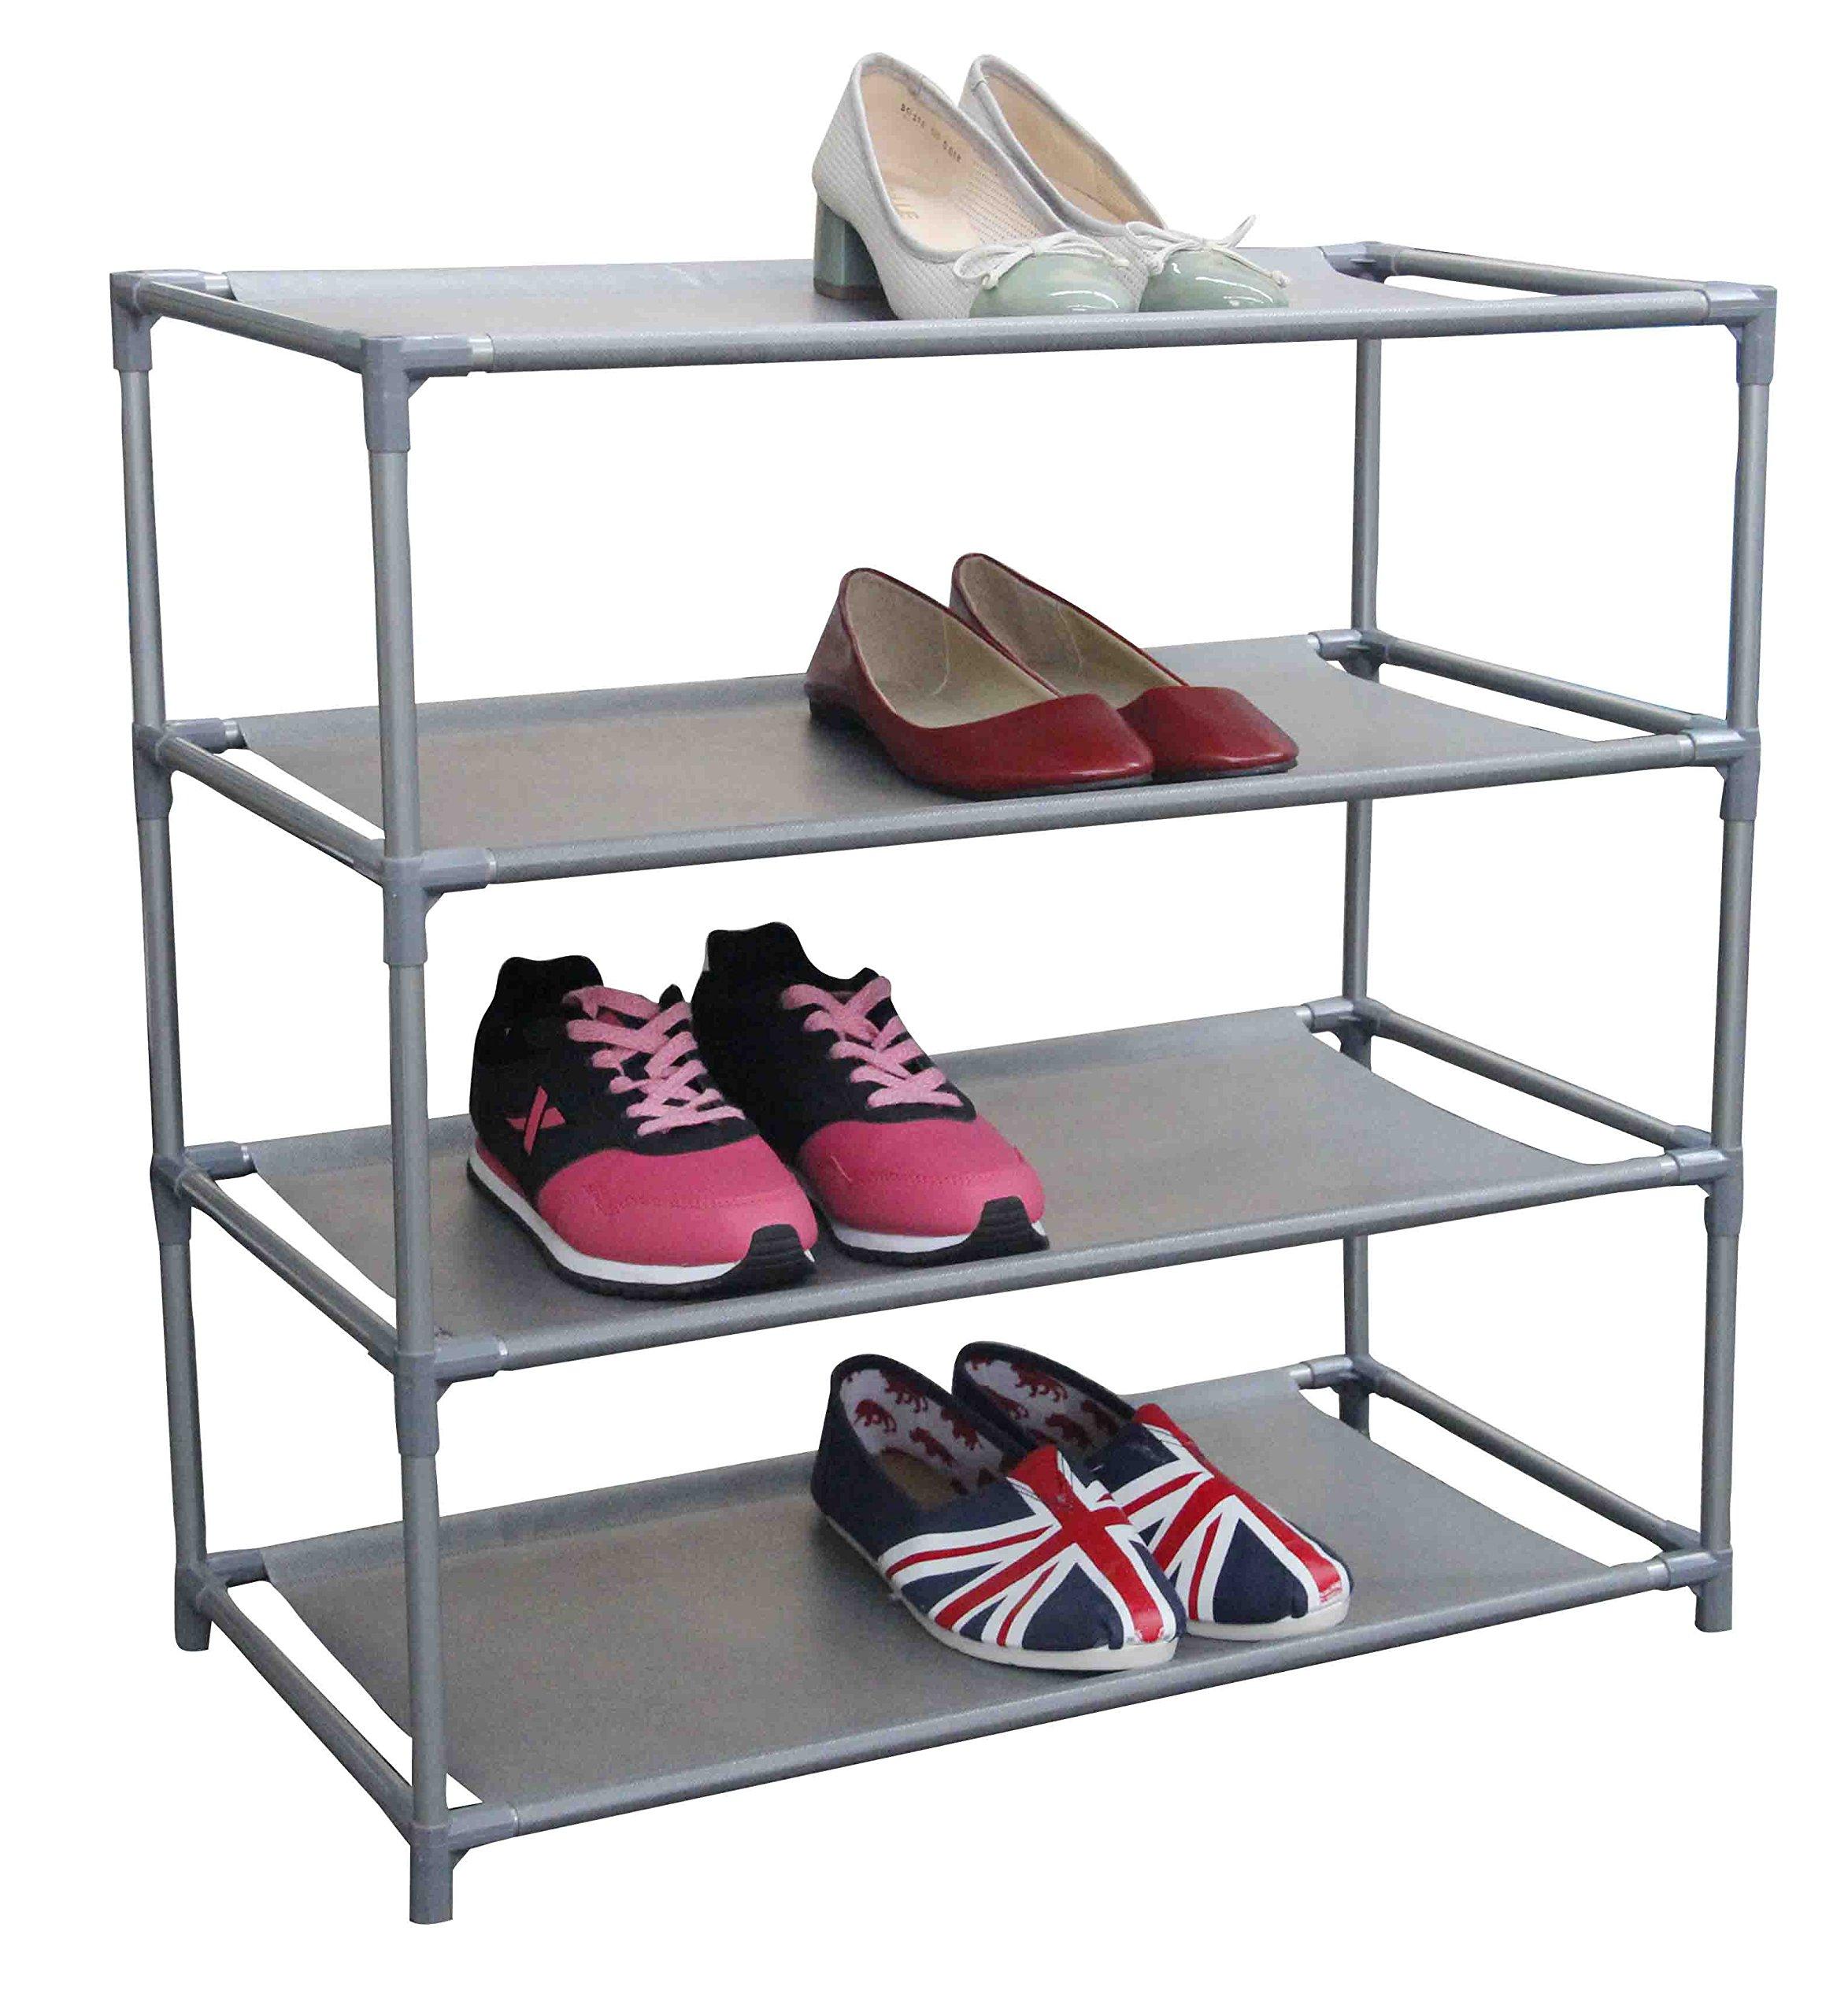 Home Basics Multipurpose 12 Pair Non-Woven Free-Standing Shoe Rack (4-Tier)